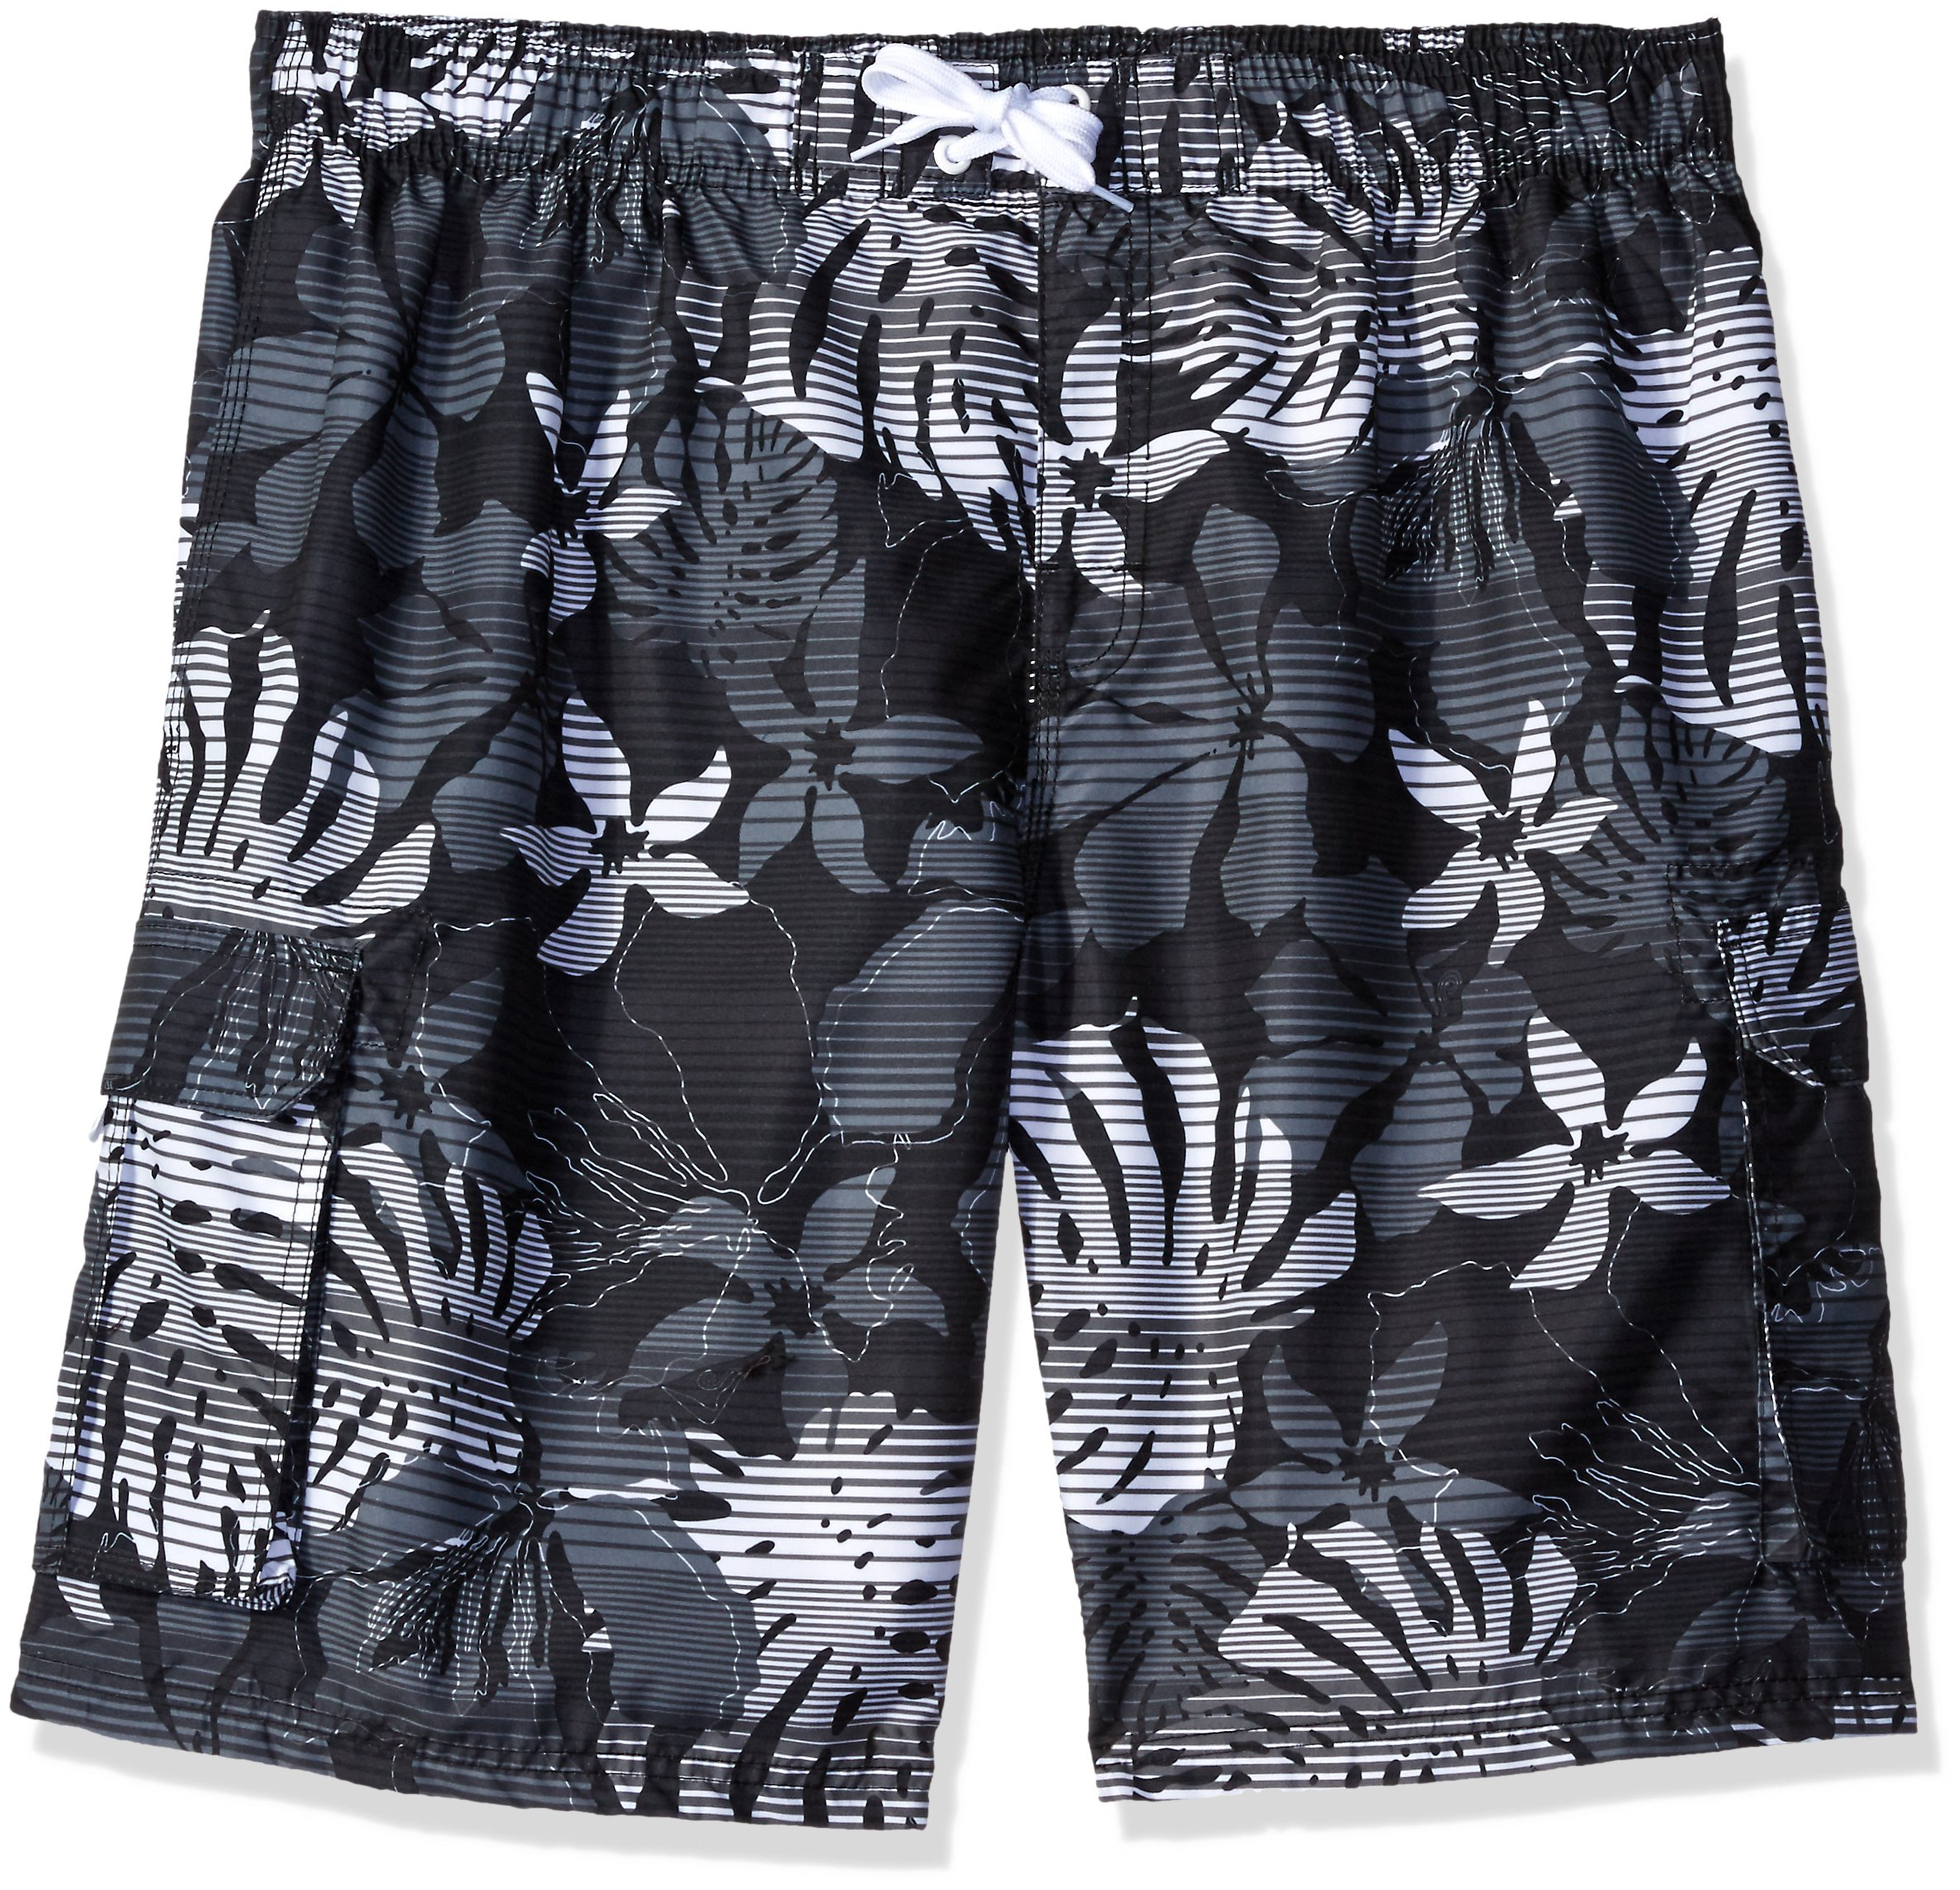 Kanu Surf Men's Barracuda Swim Trunks (Regular & Extended Sizes), Paradise Black, 3X